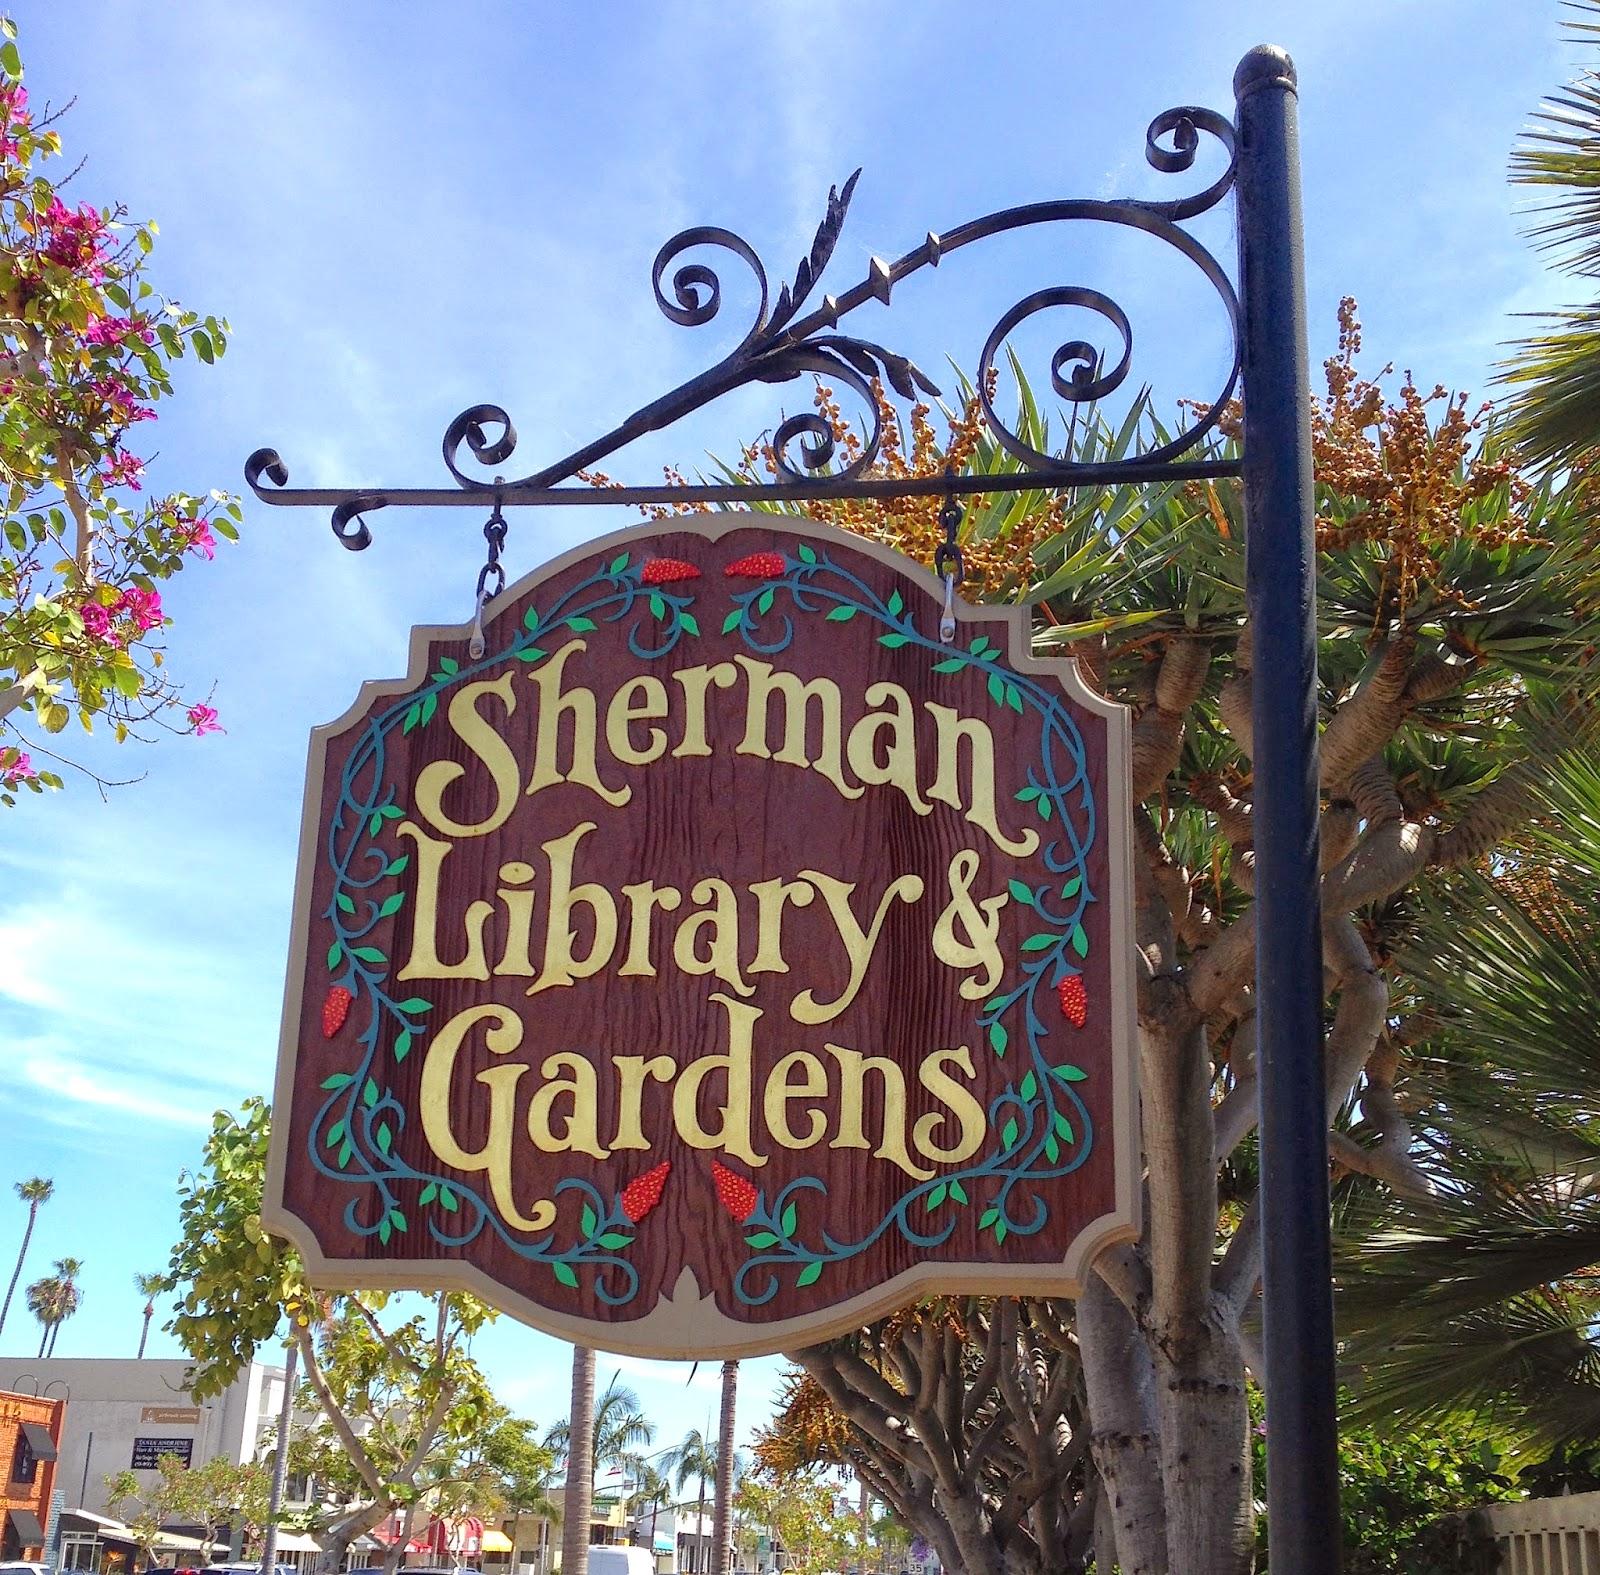 Cafe Jardin At Sherman Gardens: The Joy Of Tea